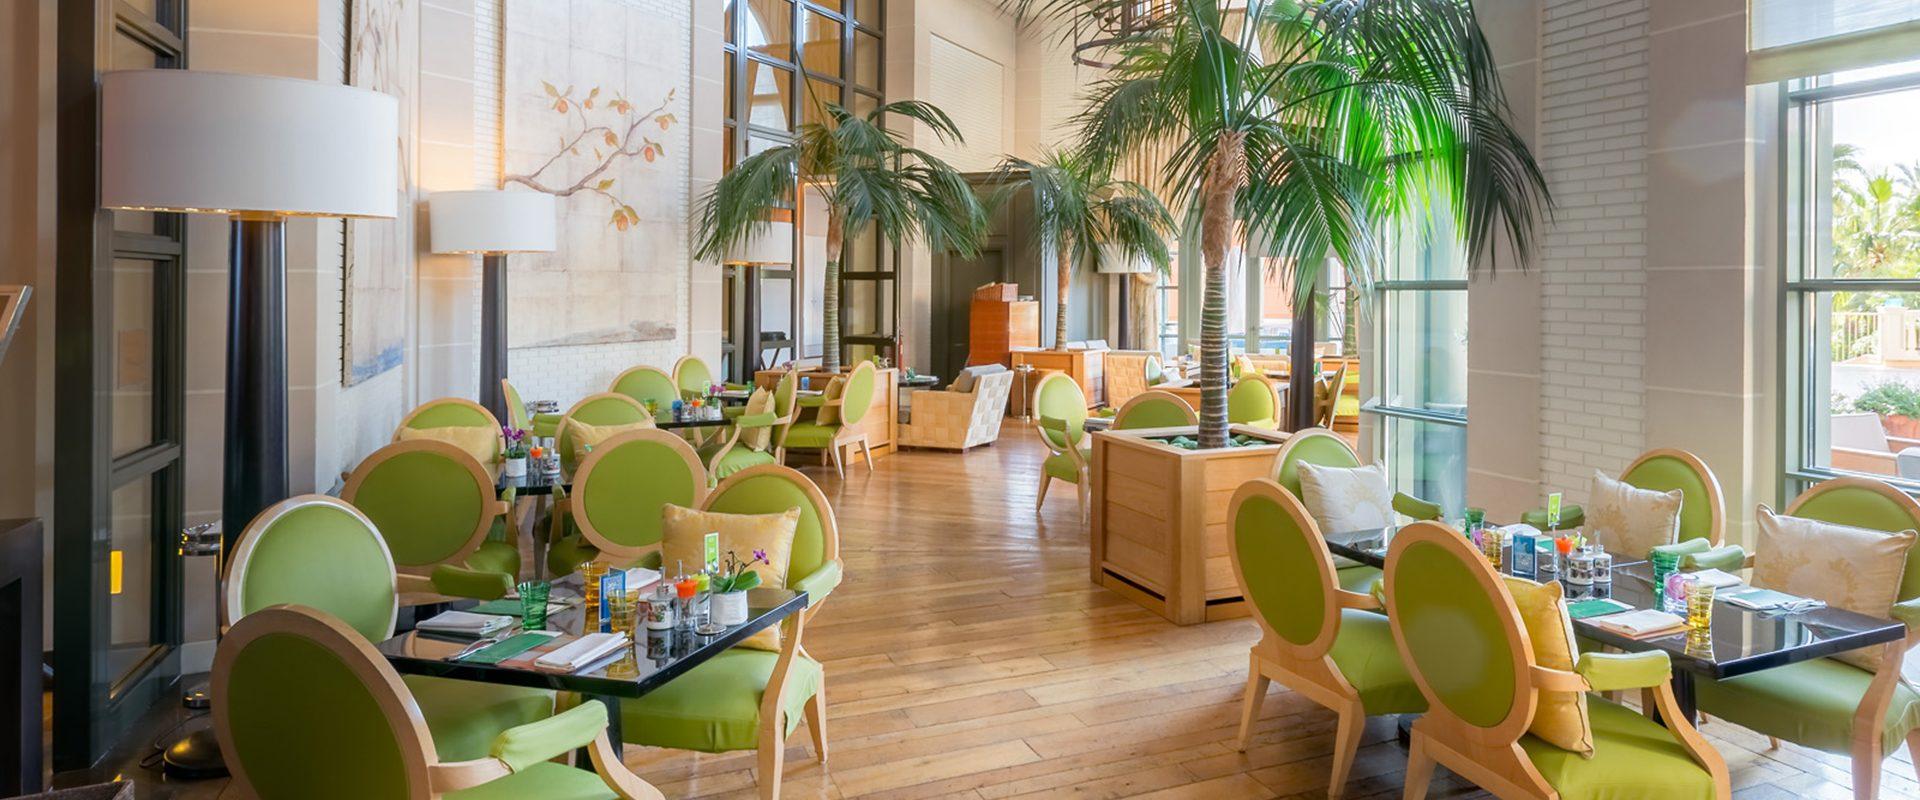 Monaco 3 - Top-DRH Monaco - Convention professionnelle - Ressources Humaines